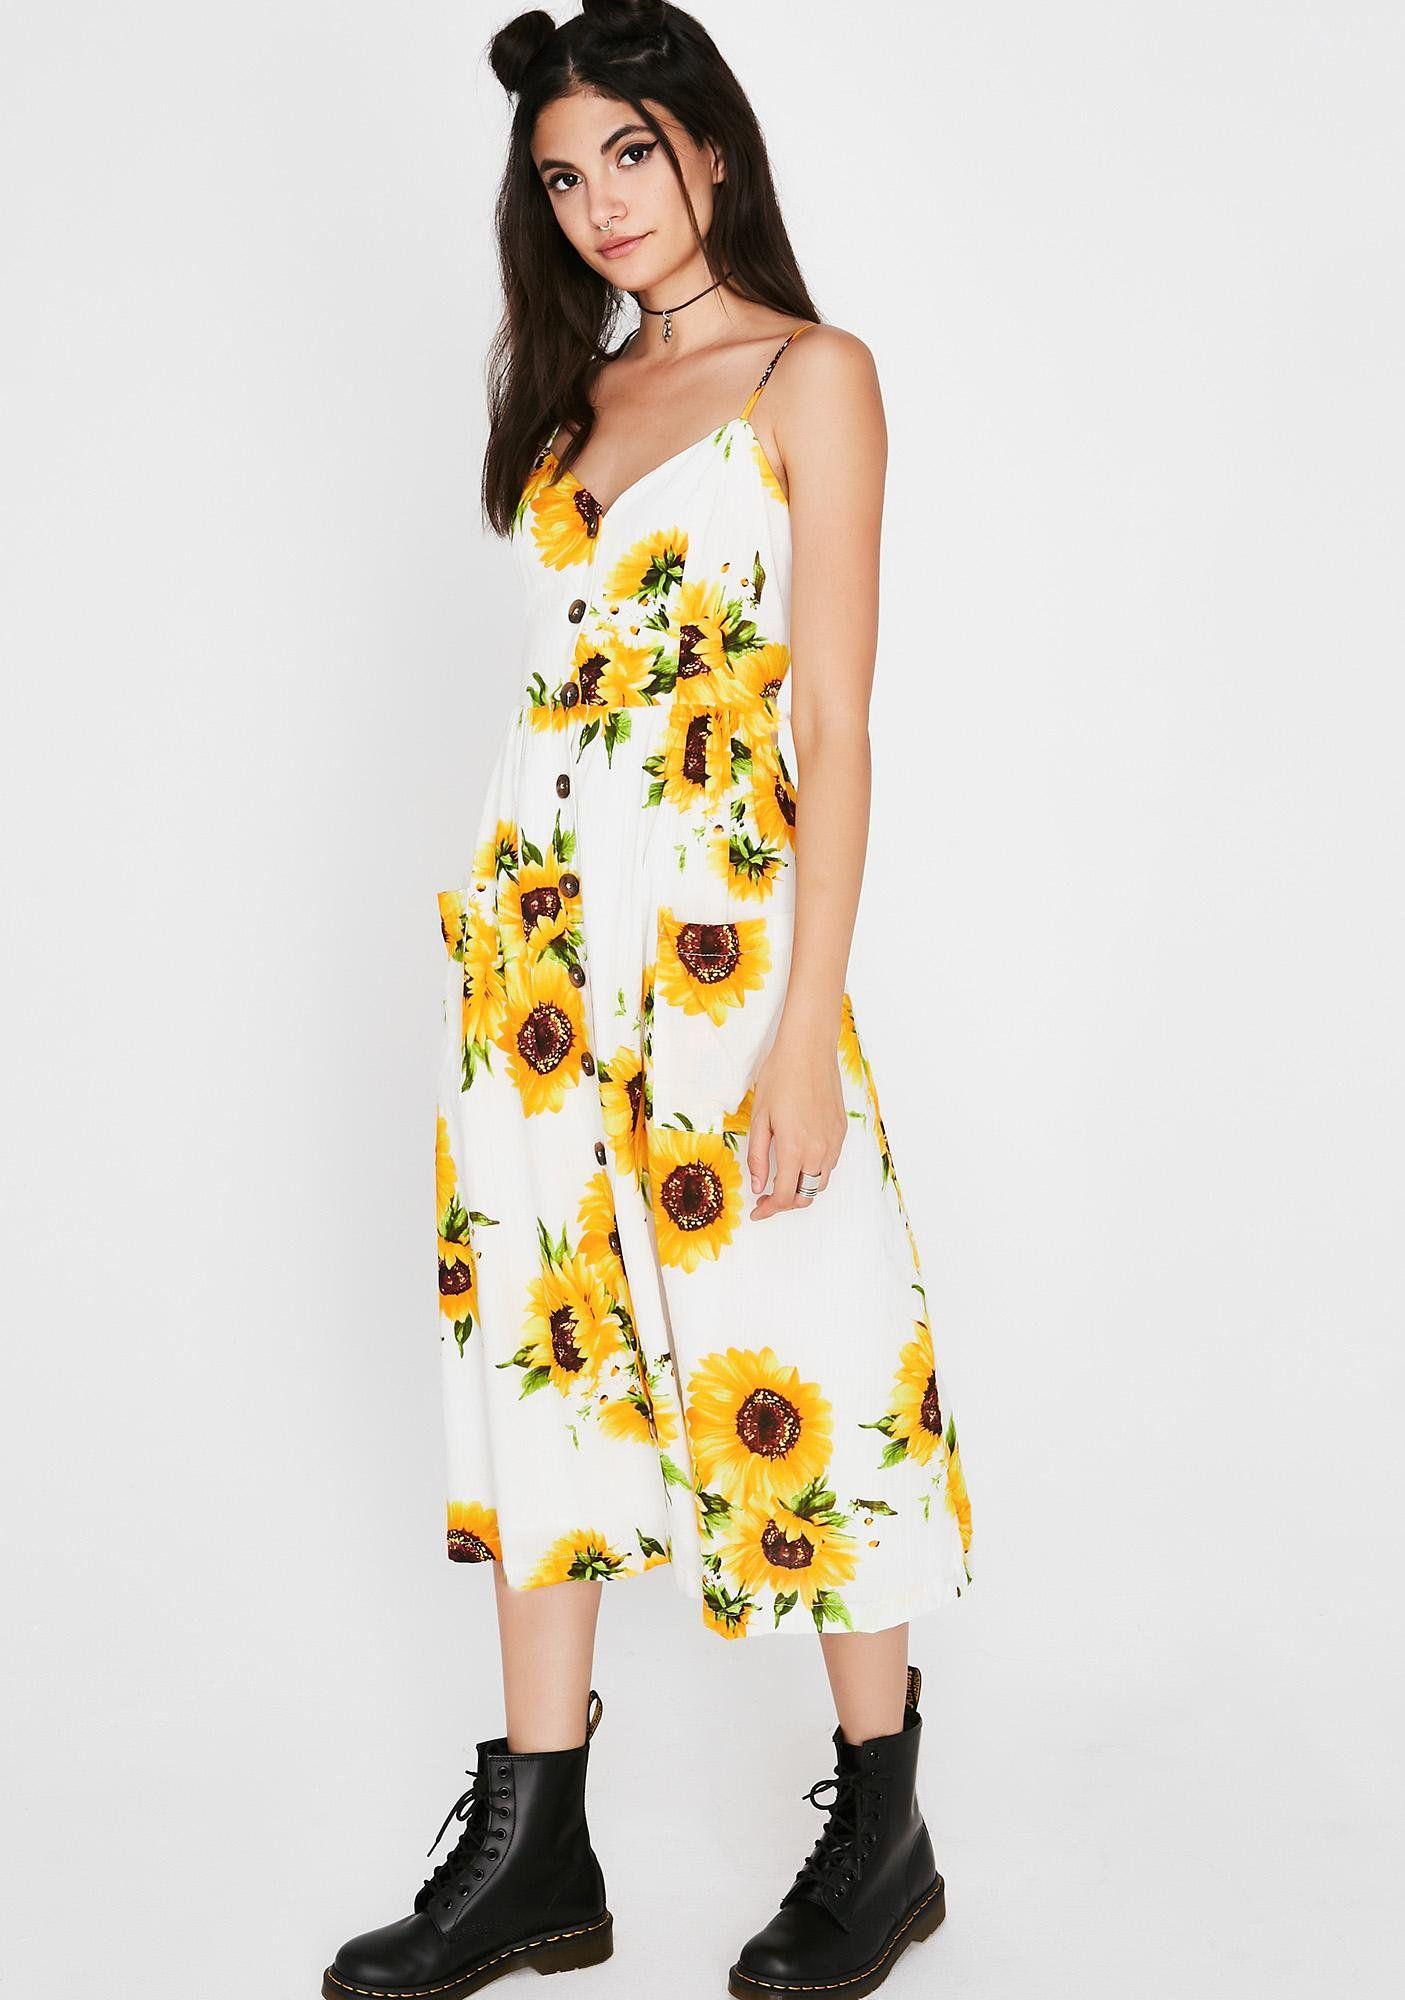 41537005e Sunflower Midi Dress | Dolls Kill#dollskill #newarrivals #frontrow  #springcollection #skirts #shorts #tshirts #accessories #dresses #sundresses